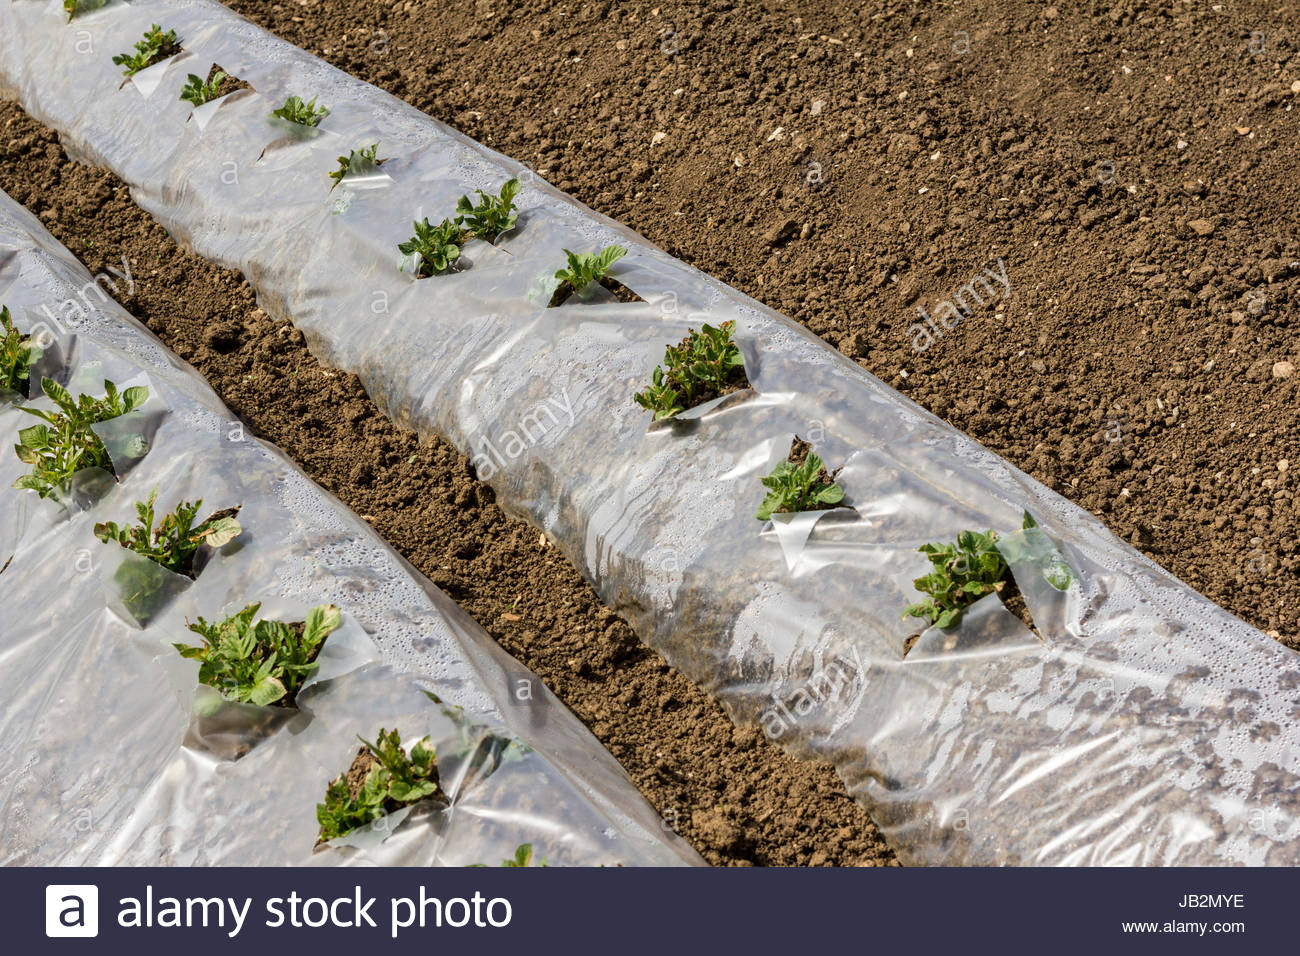 Potato plants being grown through plastic sheeting - Stock Image